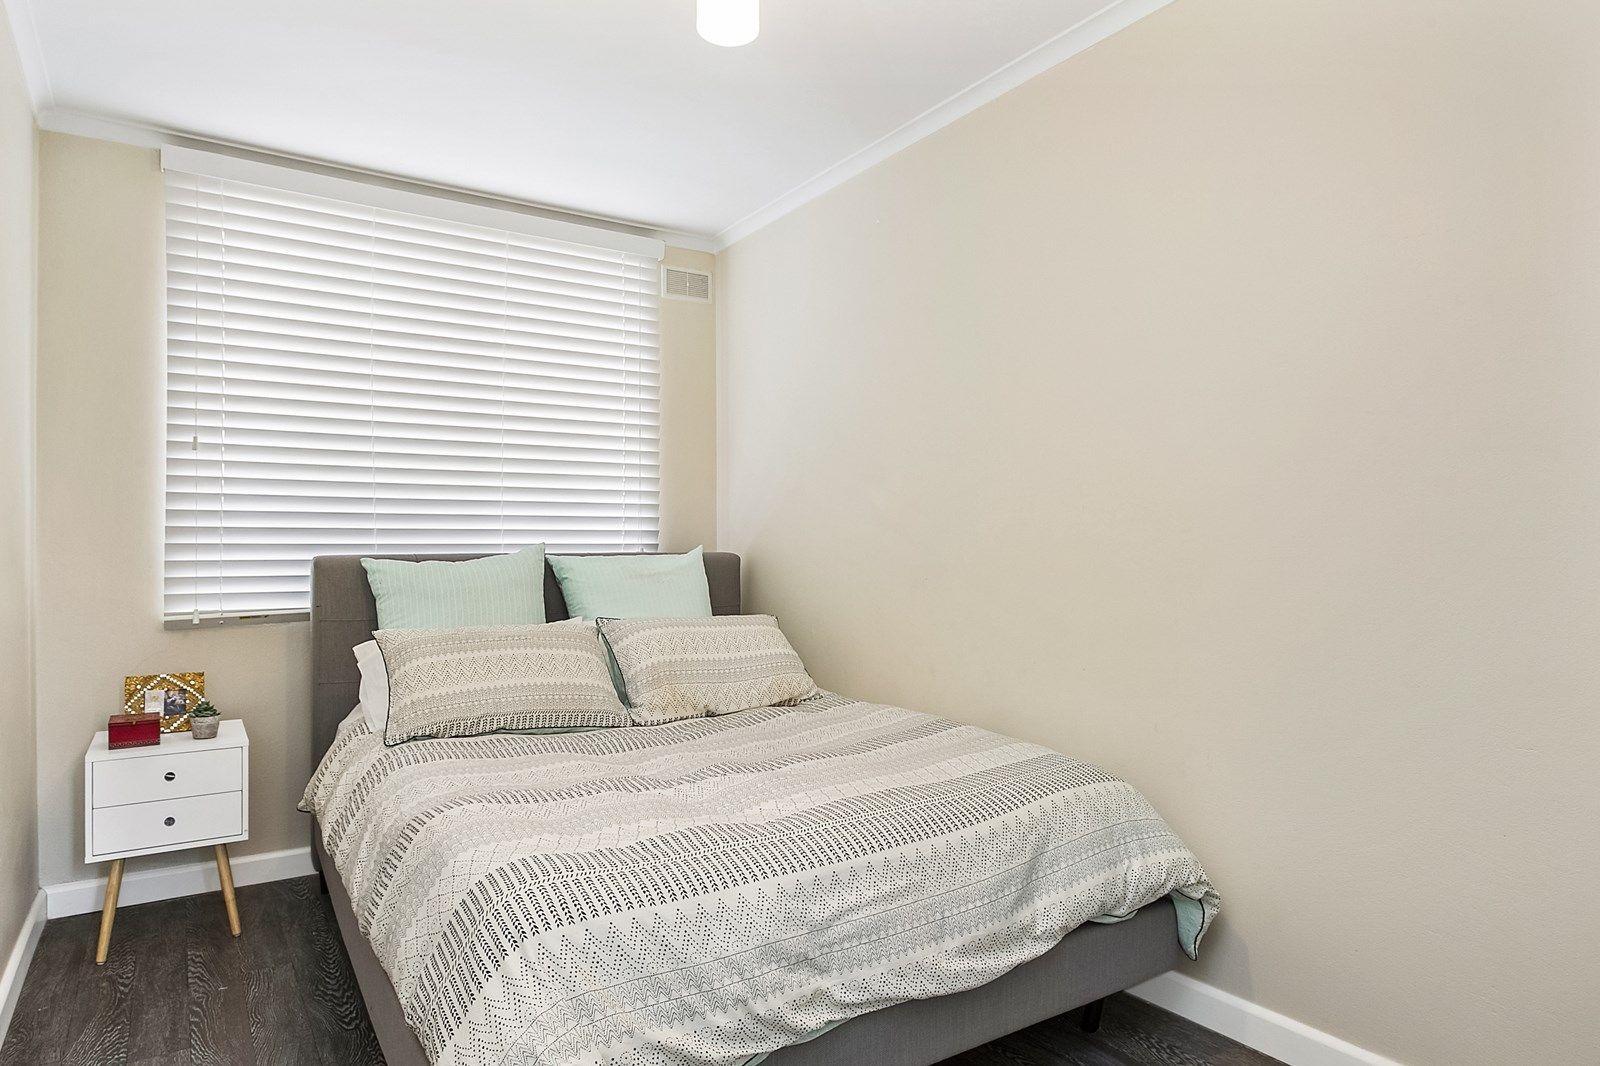 4/12 Caronia Avenue, Cronulla NSW 2230, Image 2